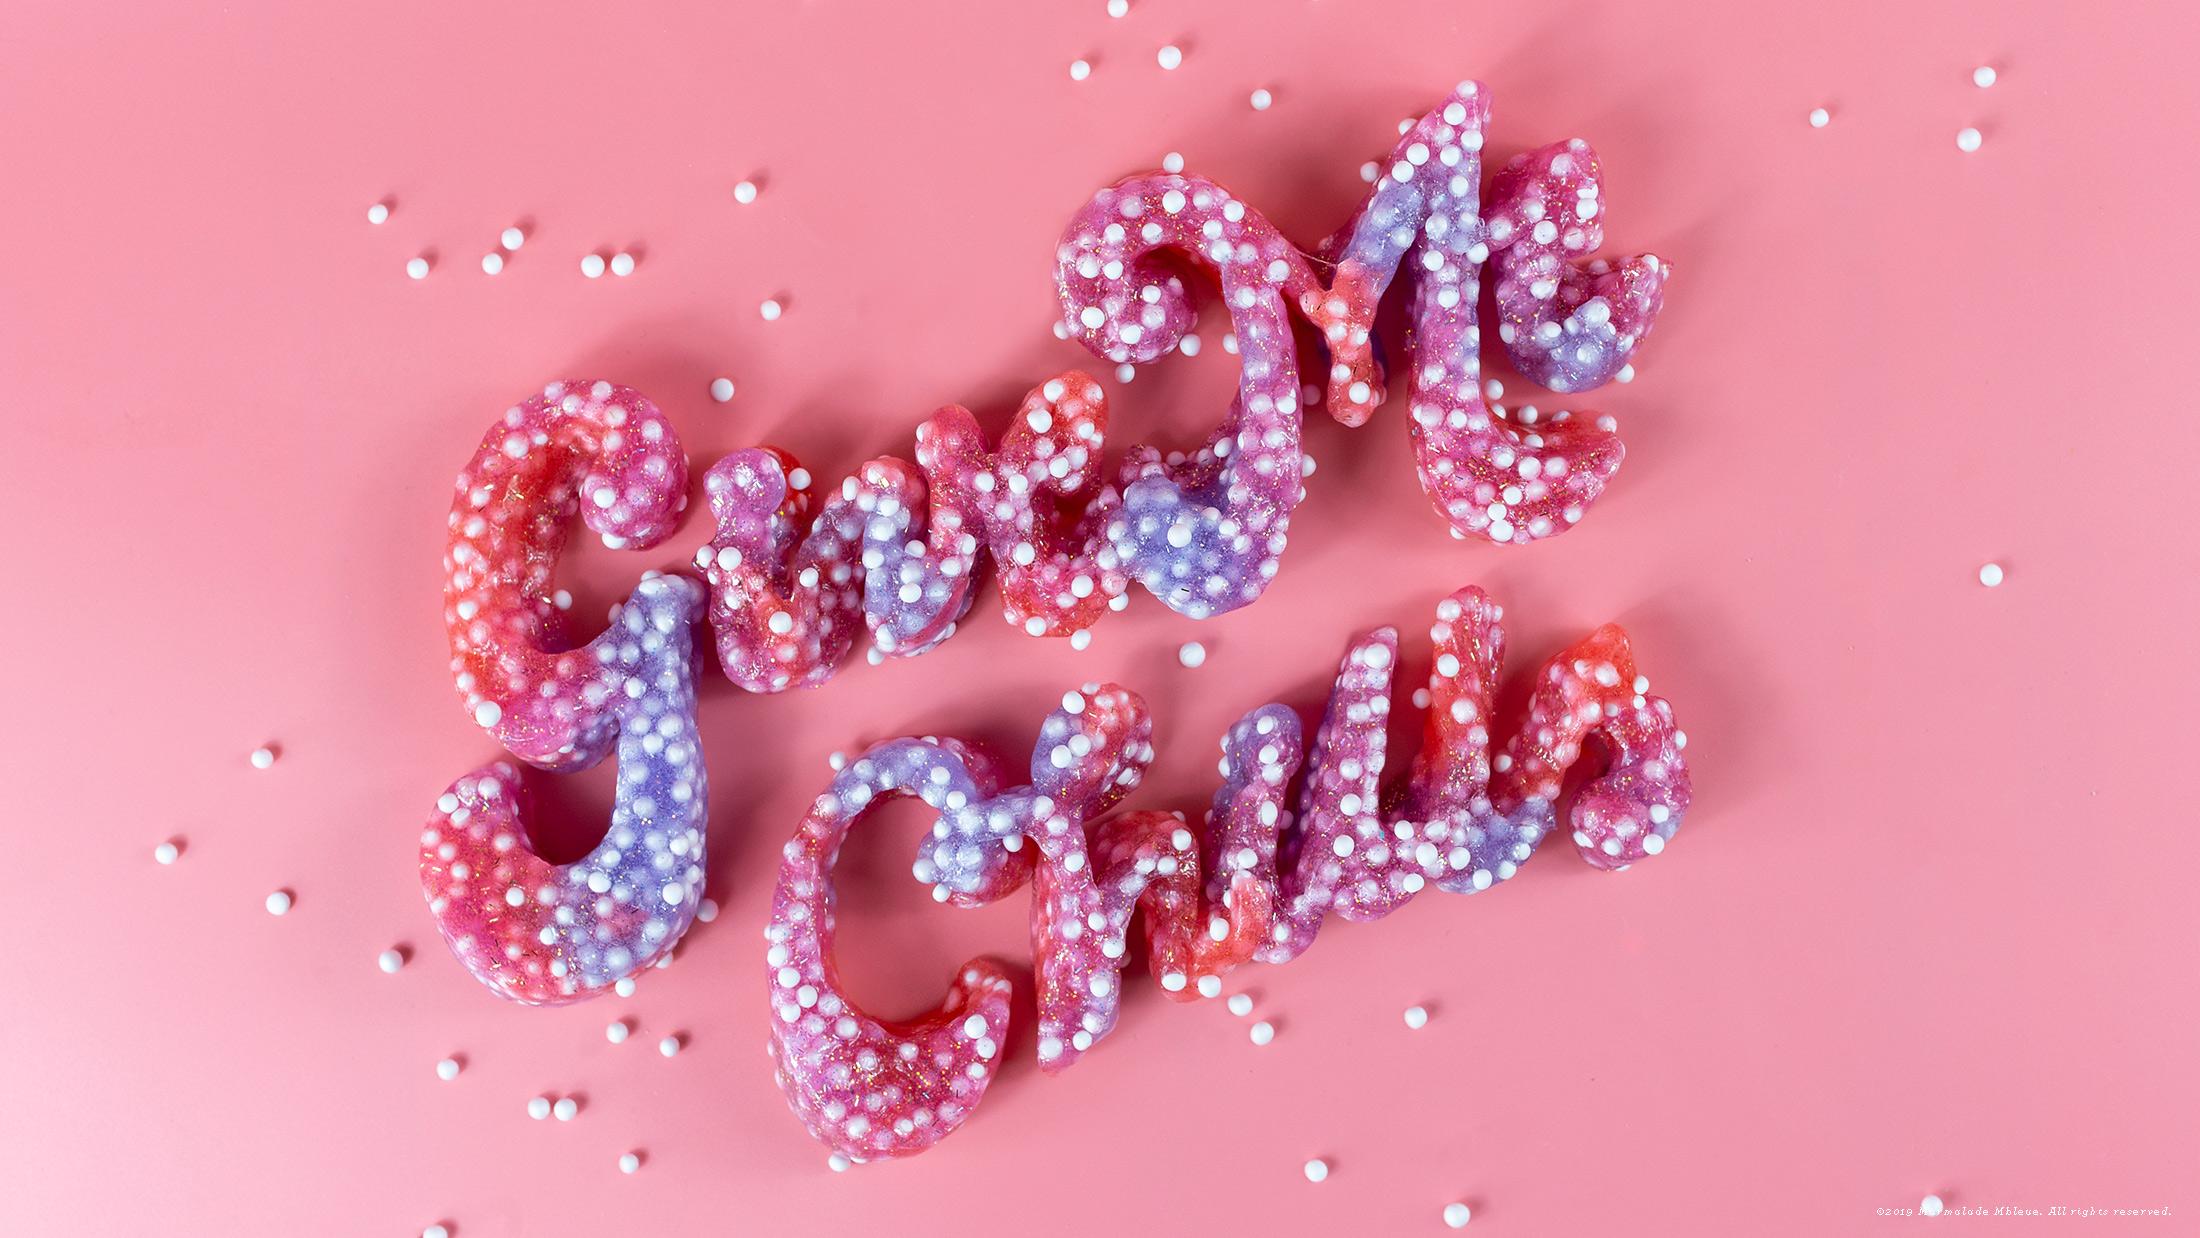 ASMR-give-me-chills-banner.jpg